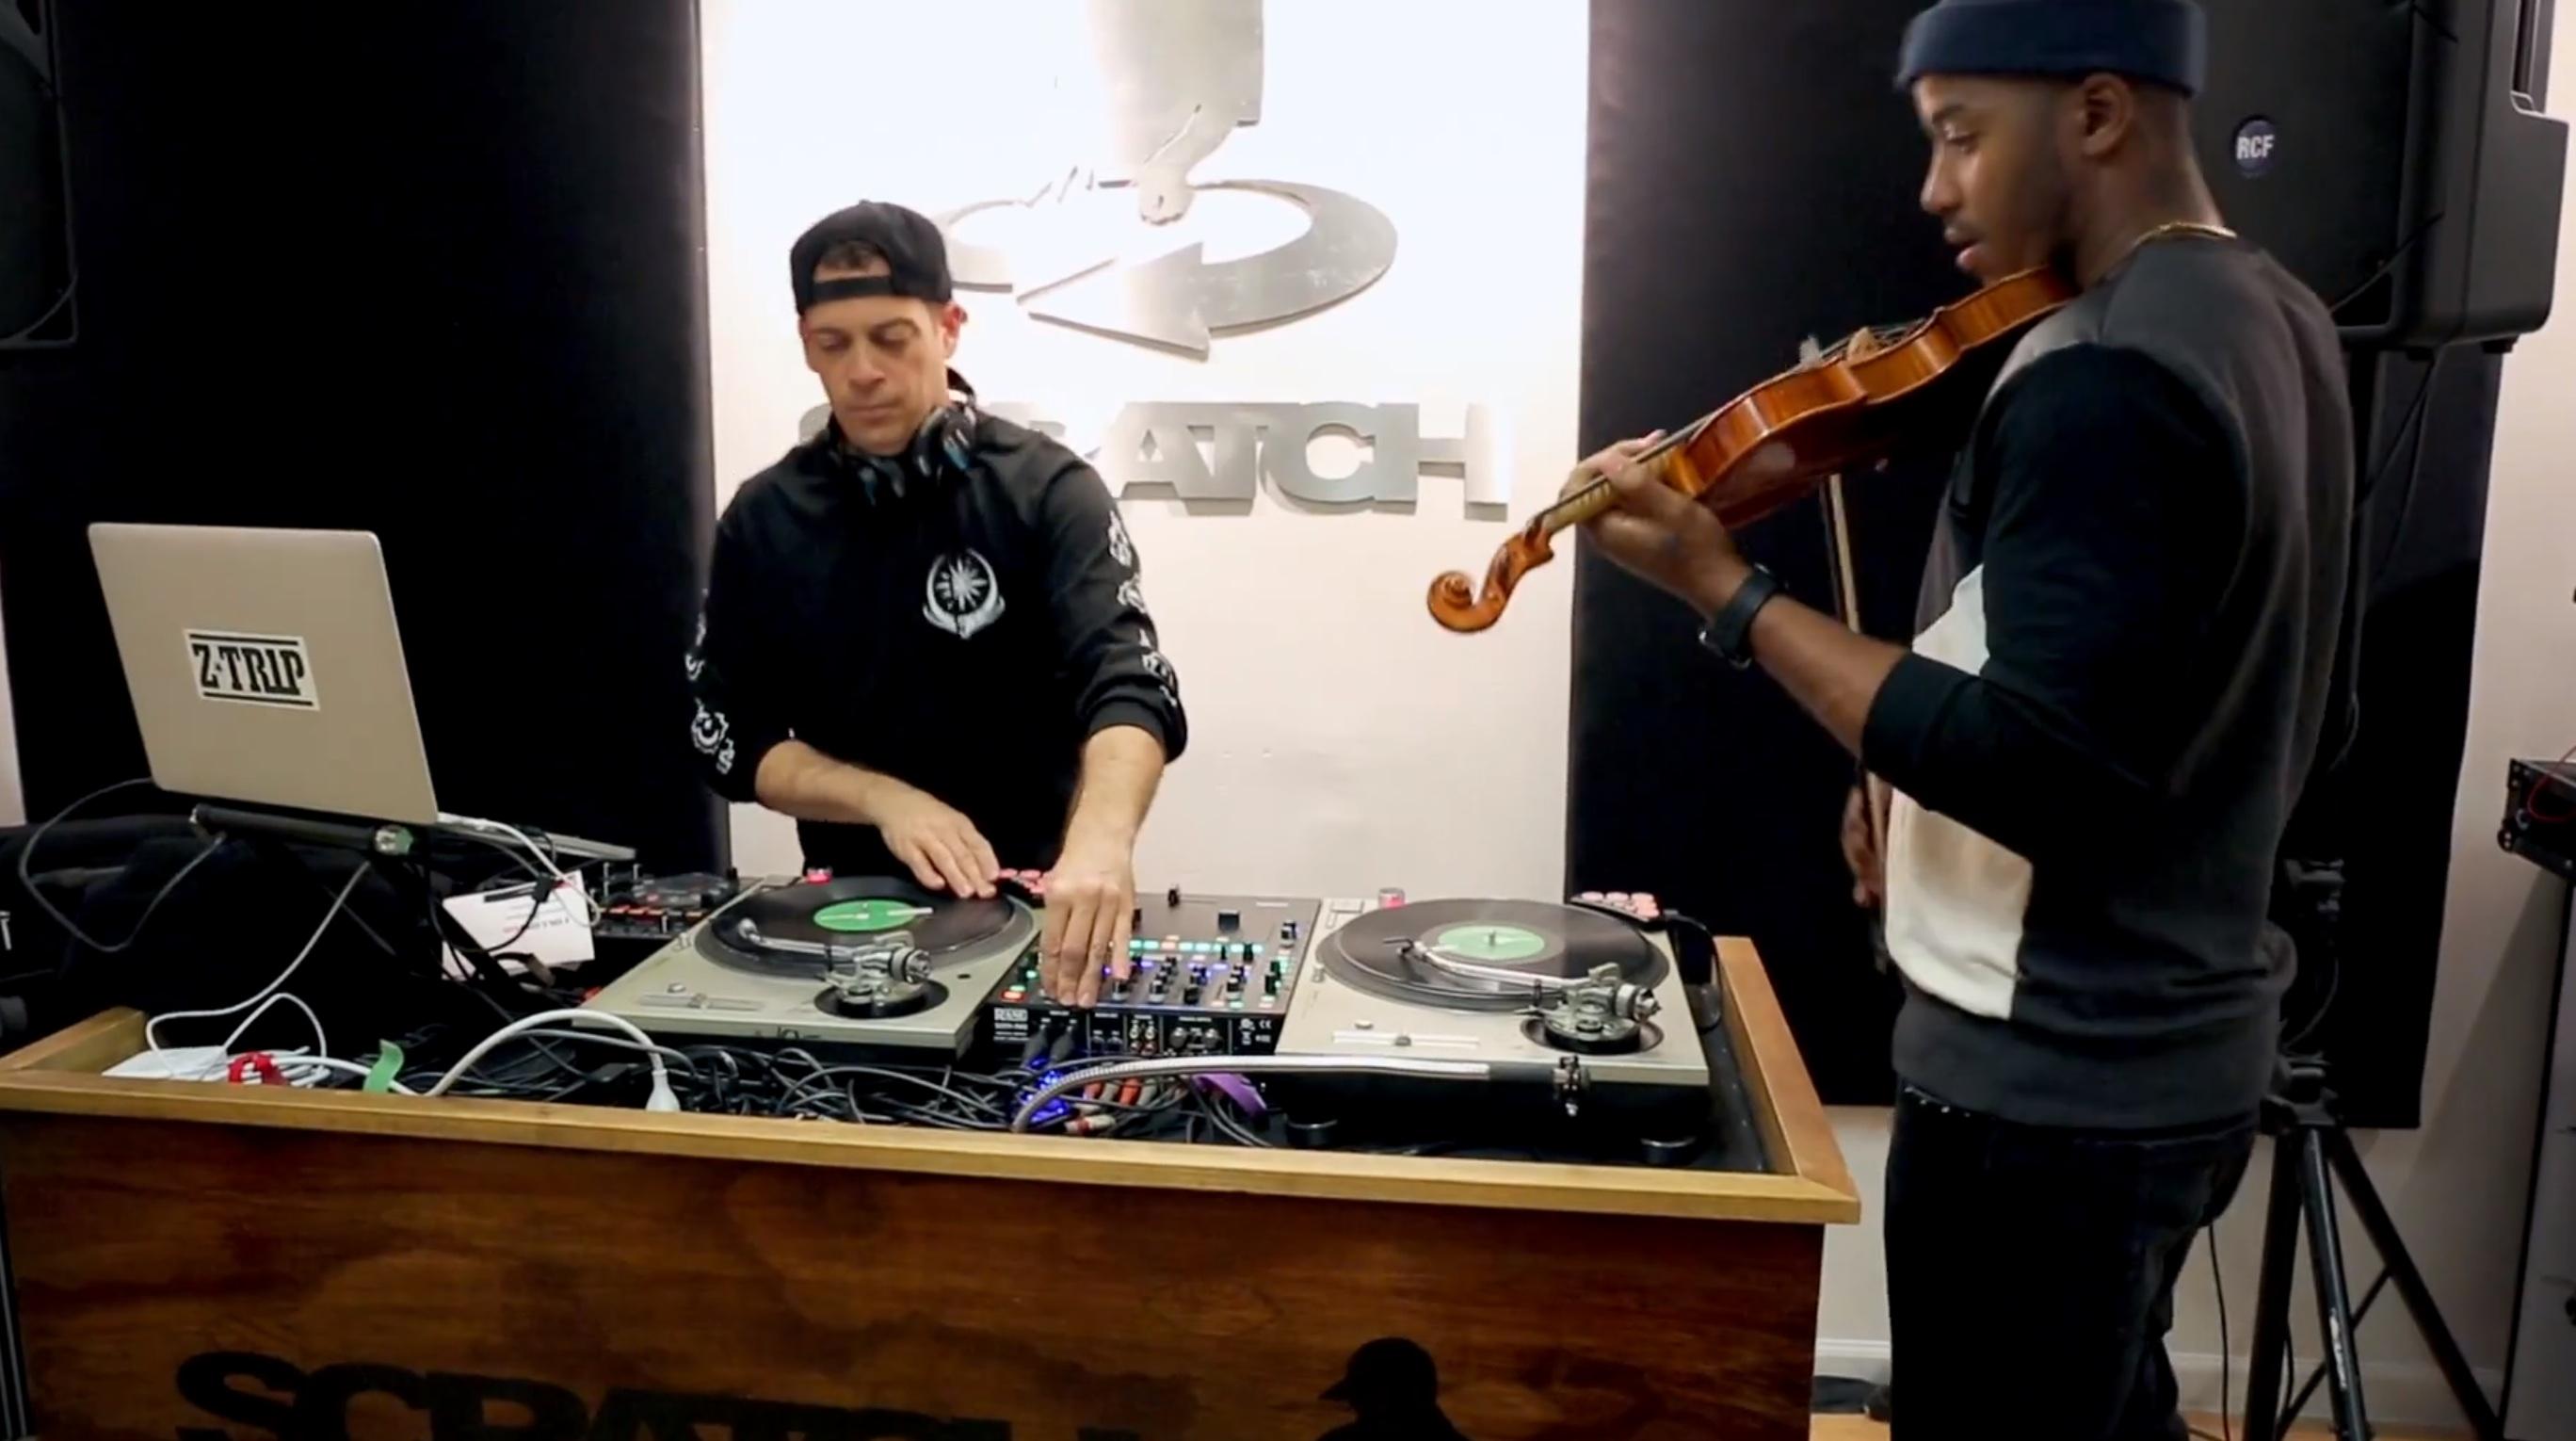 Video: Z-Trip & Damien Escobar - Scratching vs. Violine